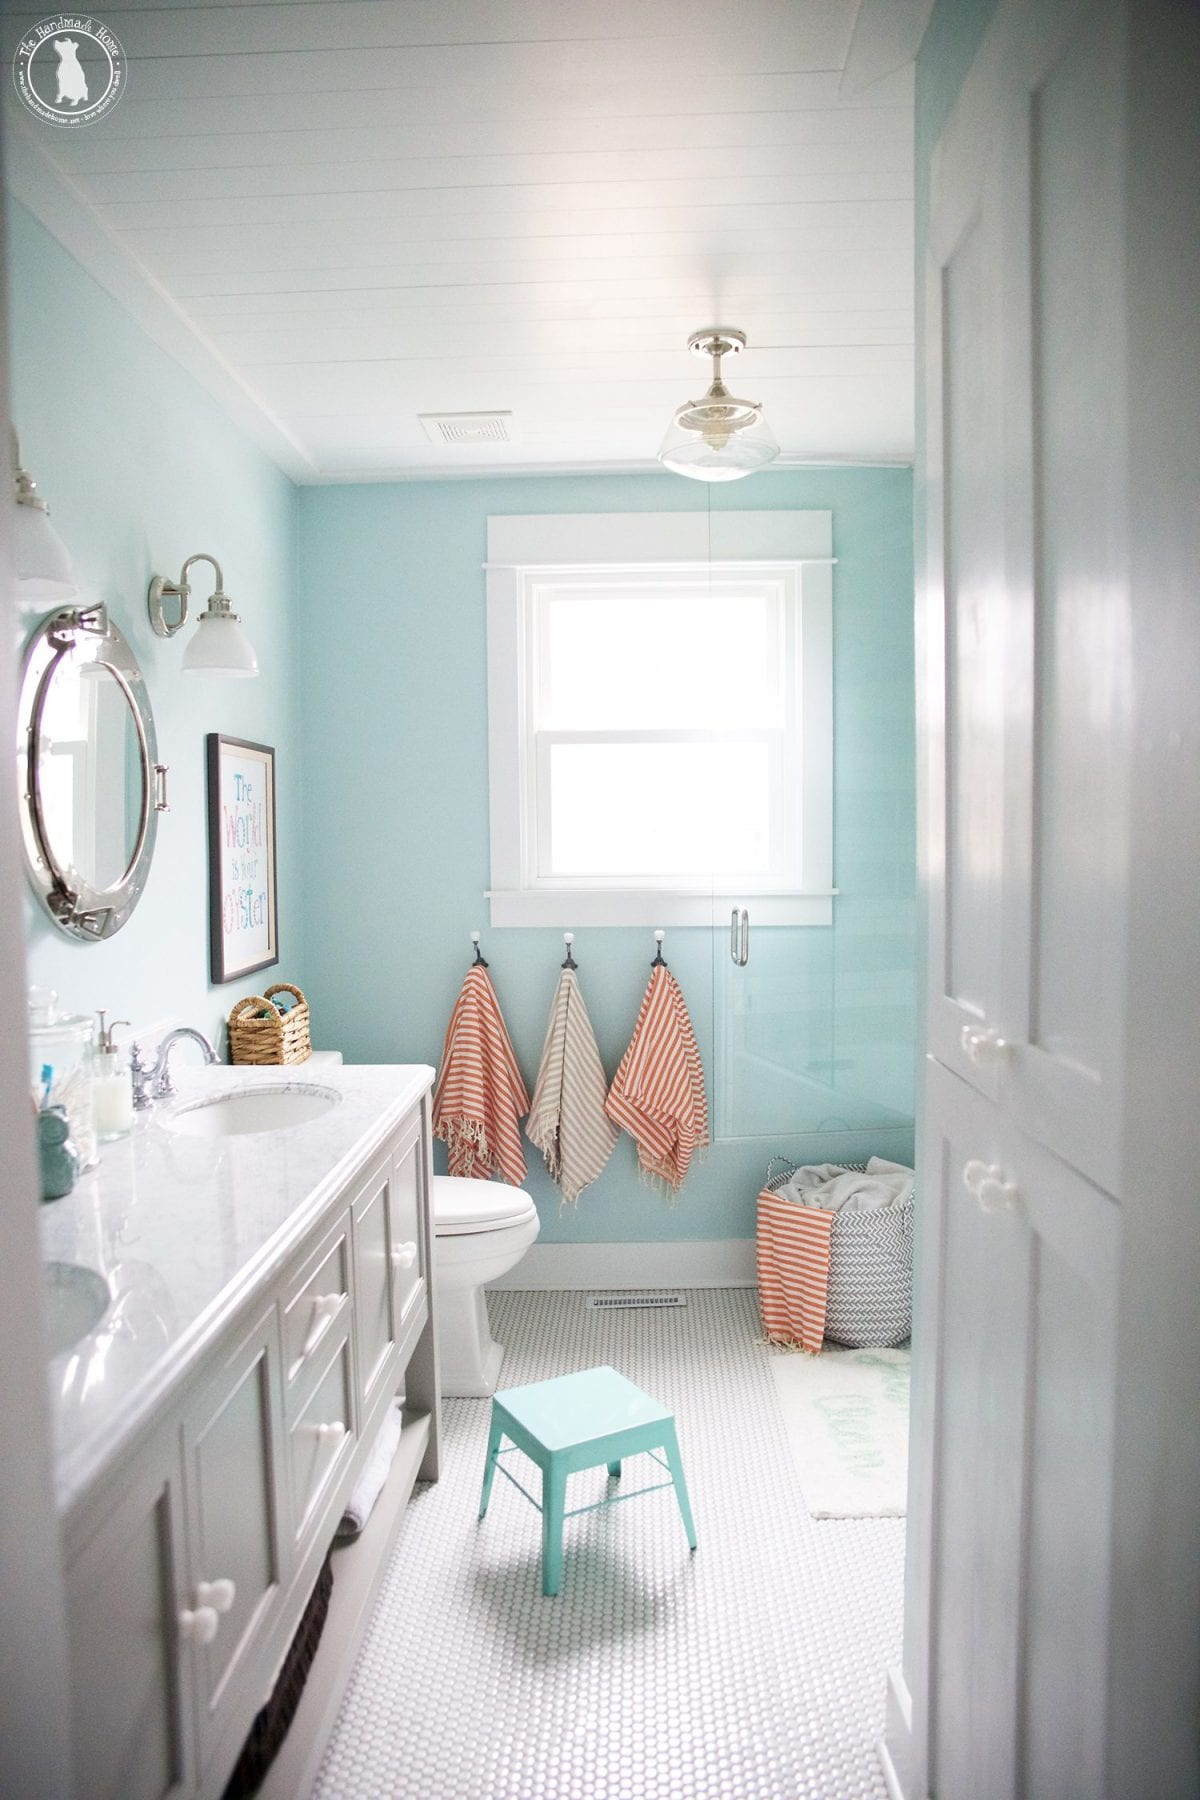 the kids bathroom - the handmade home